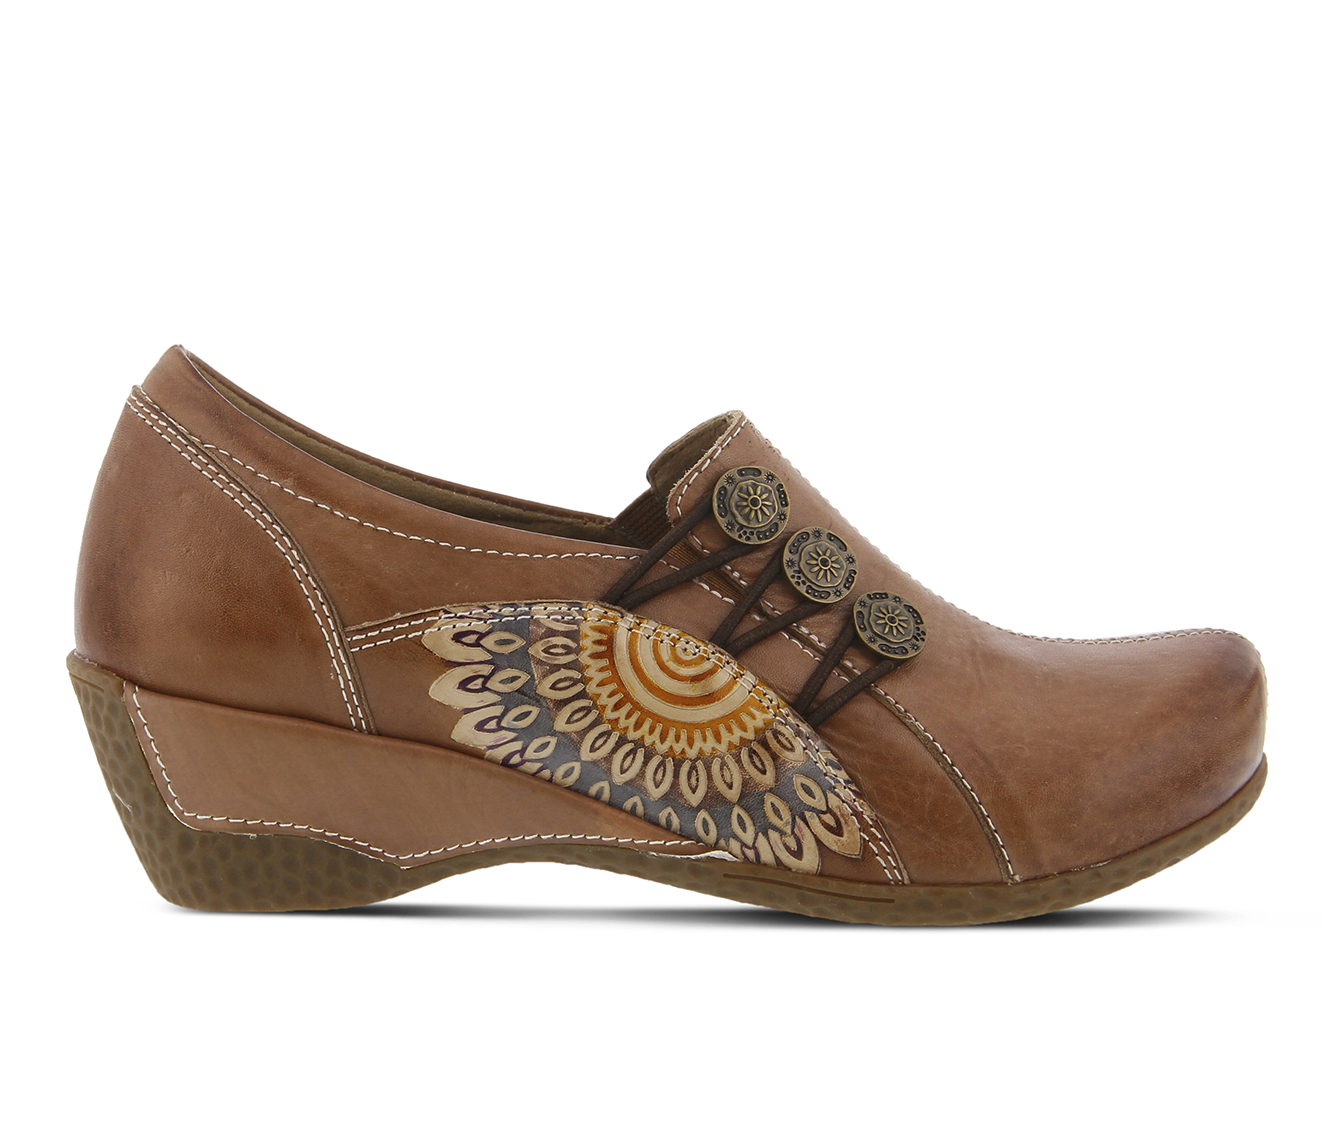 L'Artiste Agacia Women's Shoe (Brown Leather)